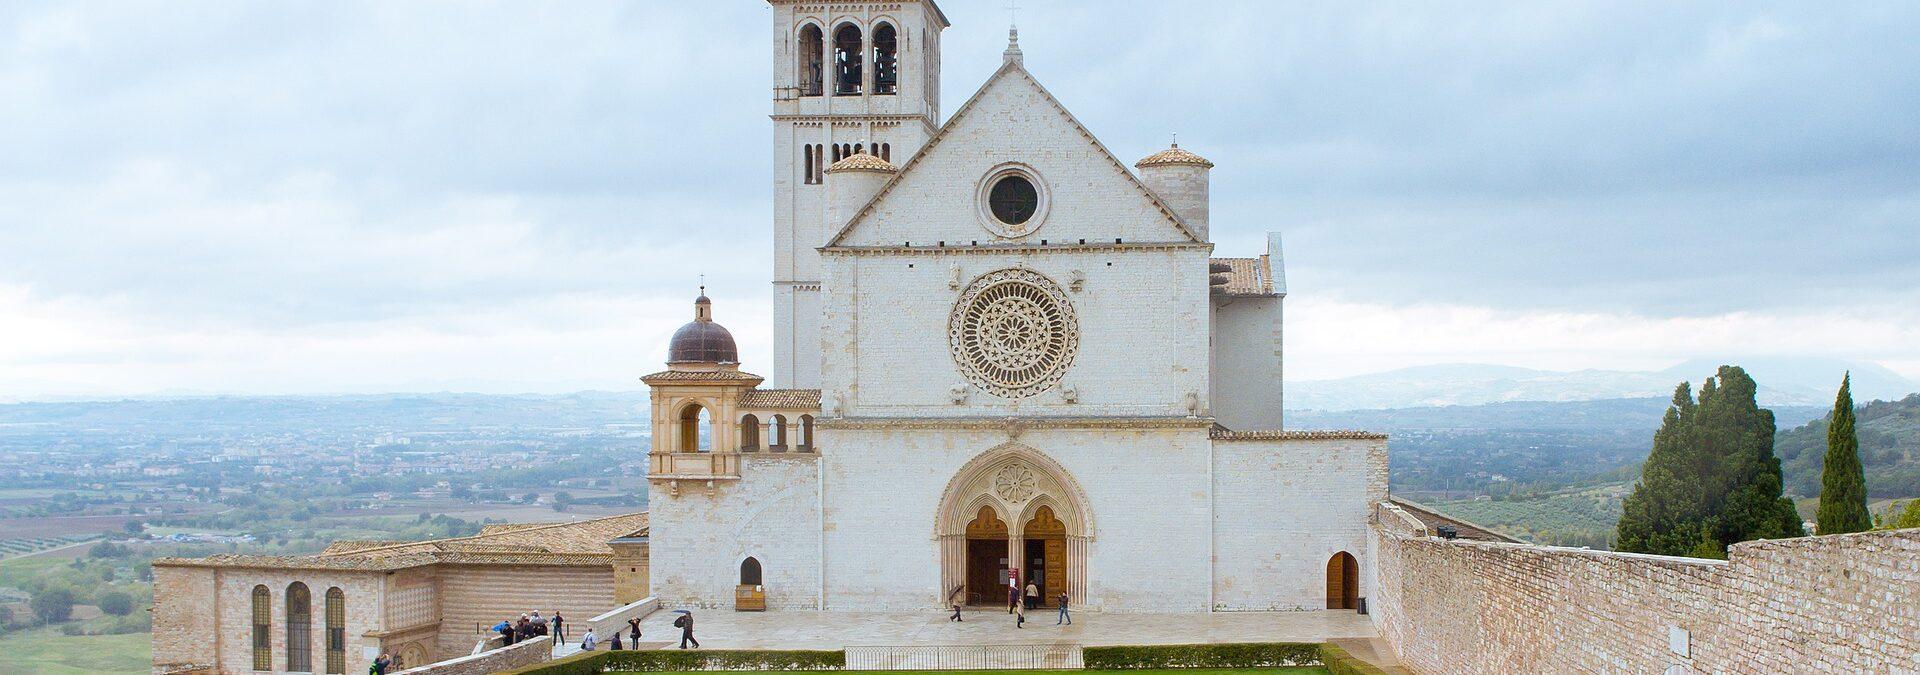 Assisi e i borghi medievali dell'Umbria